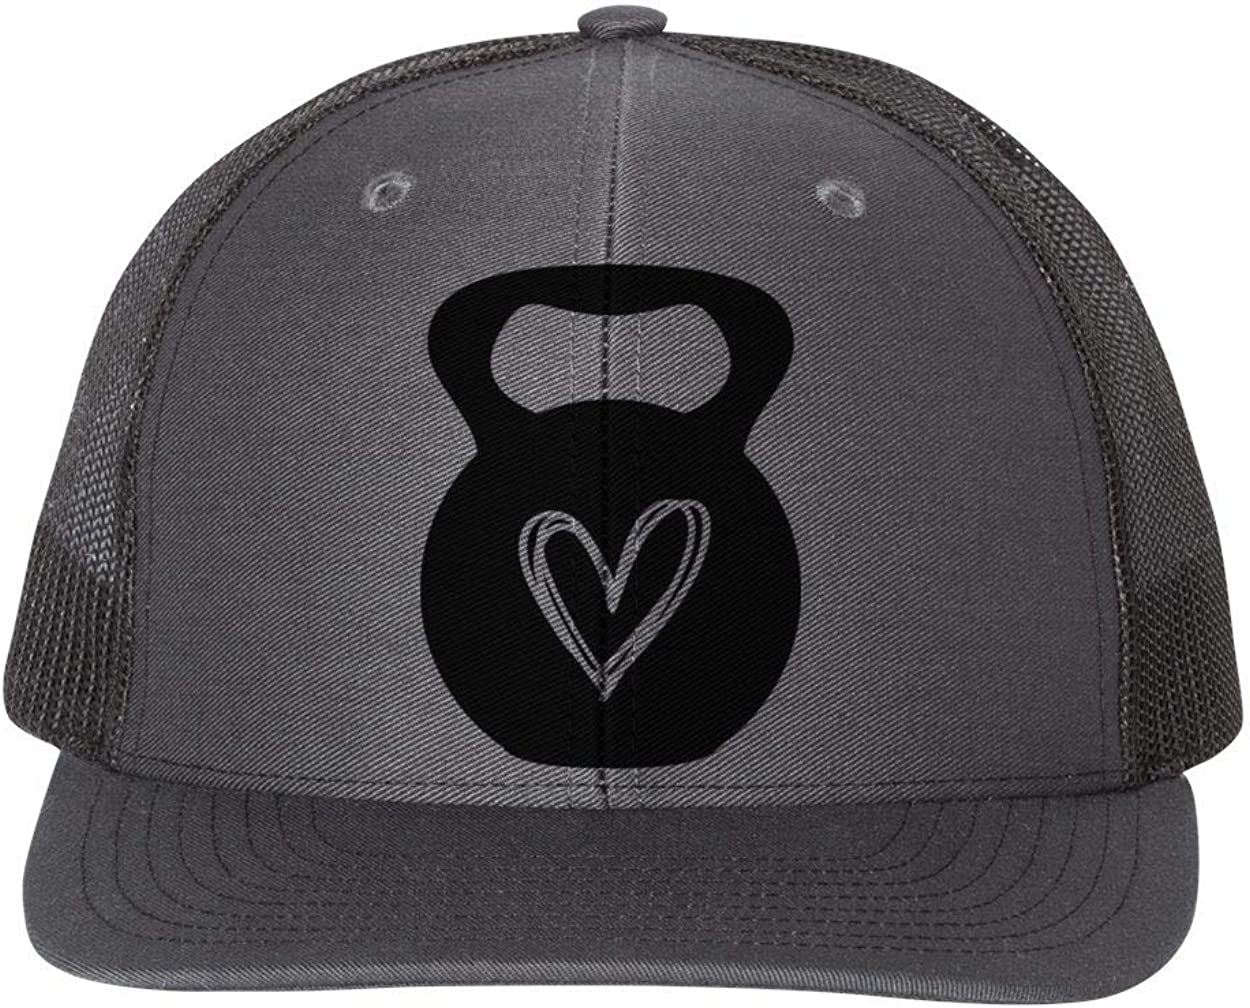 Ebenezer Fire Apparel Dumbbell Heart//Crossfit Hat//Adjustable Snapback//Black Text